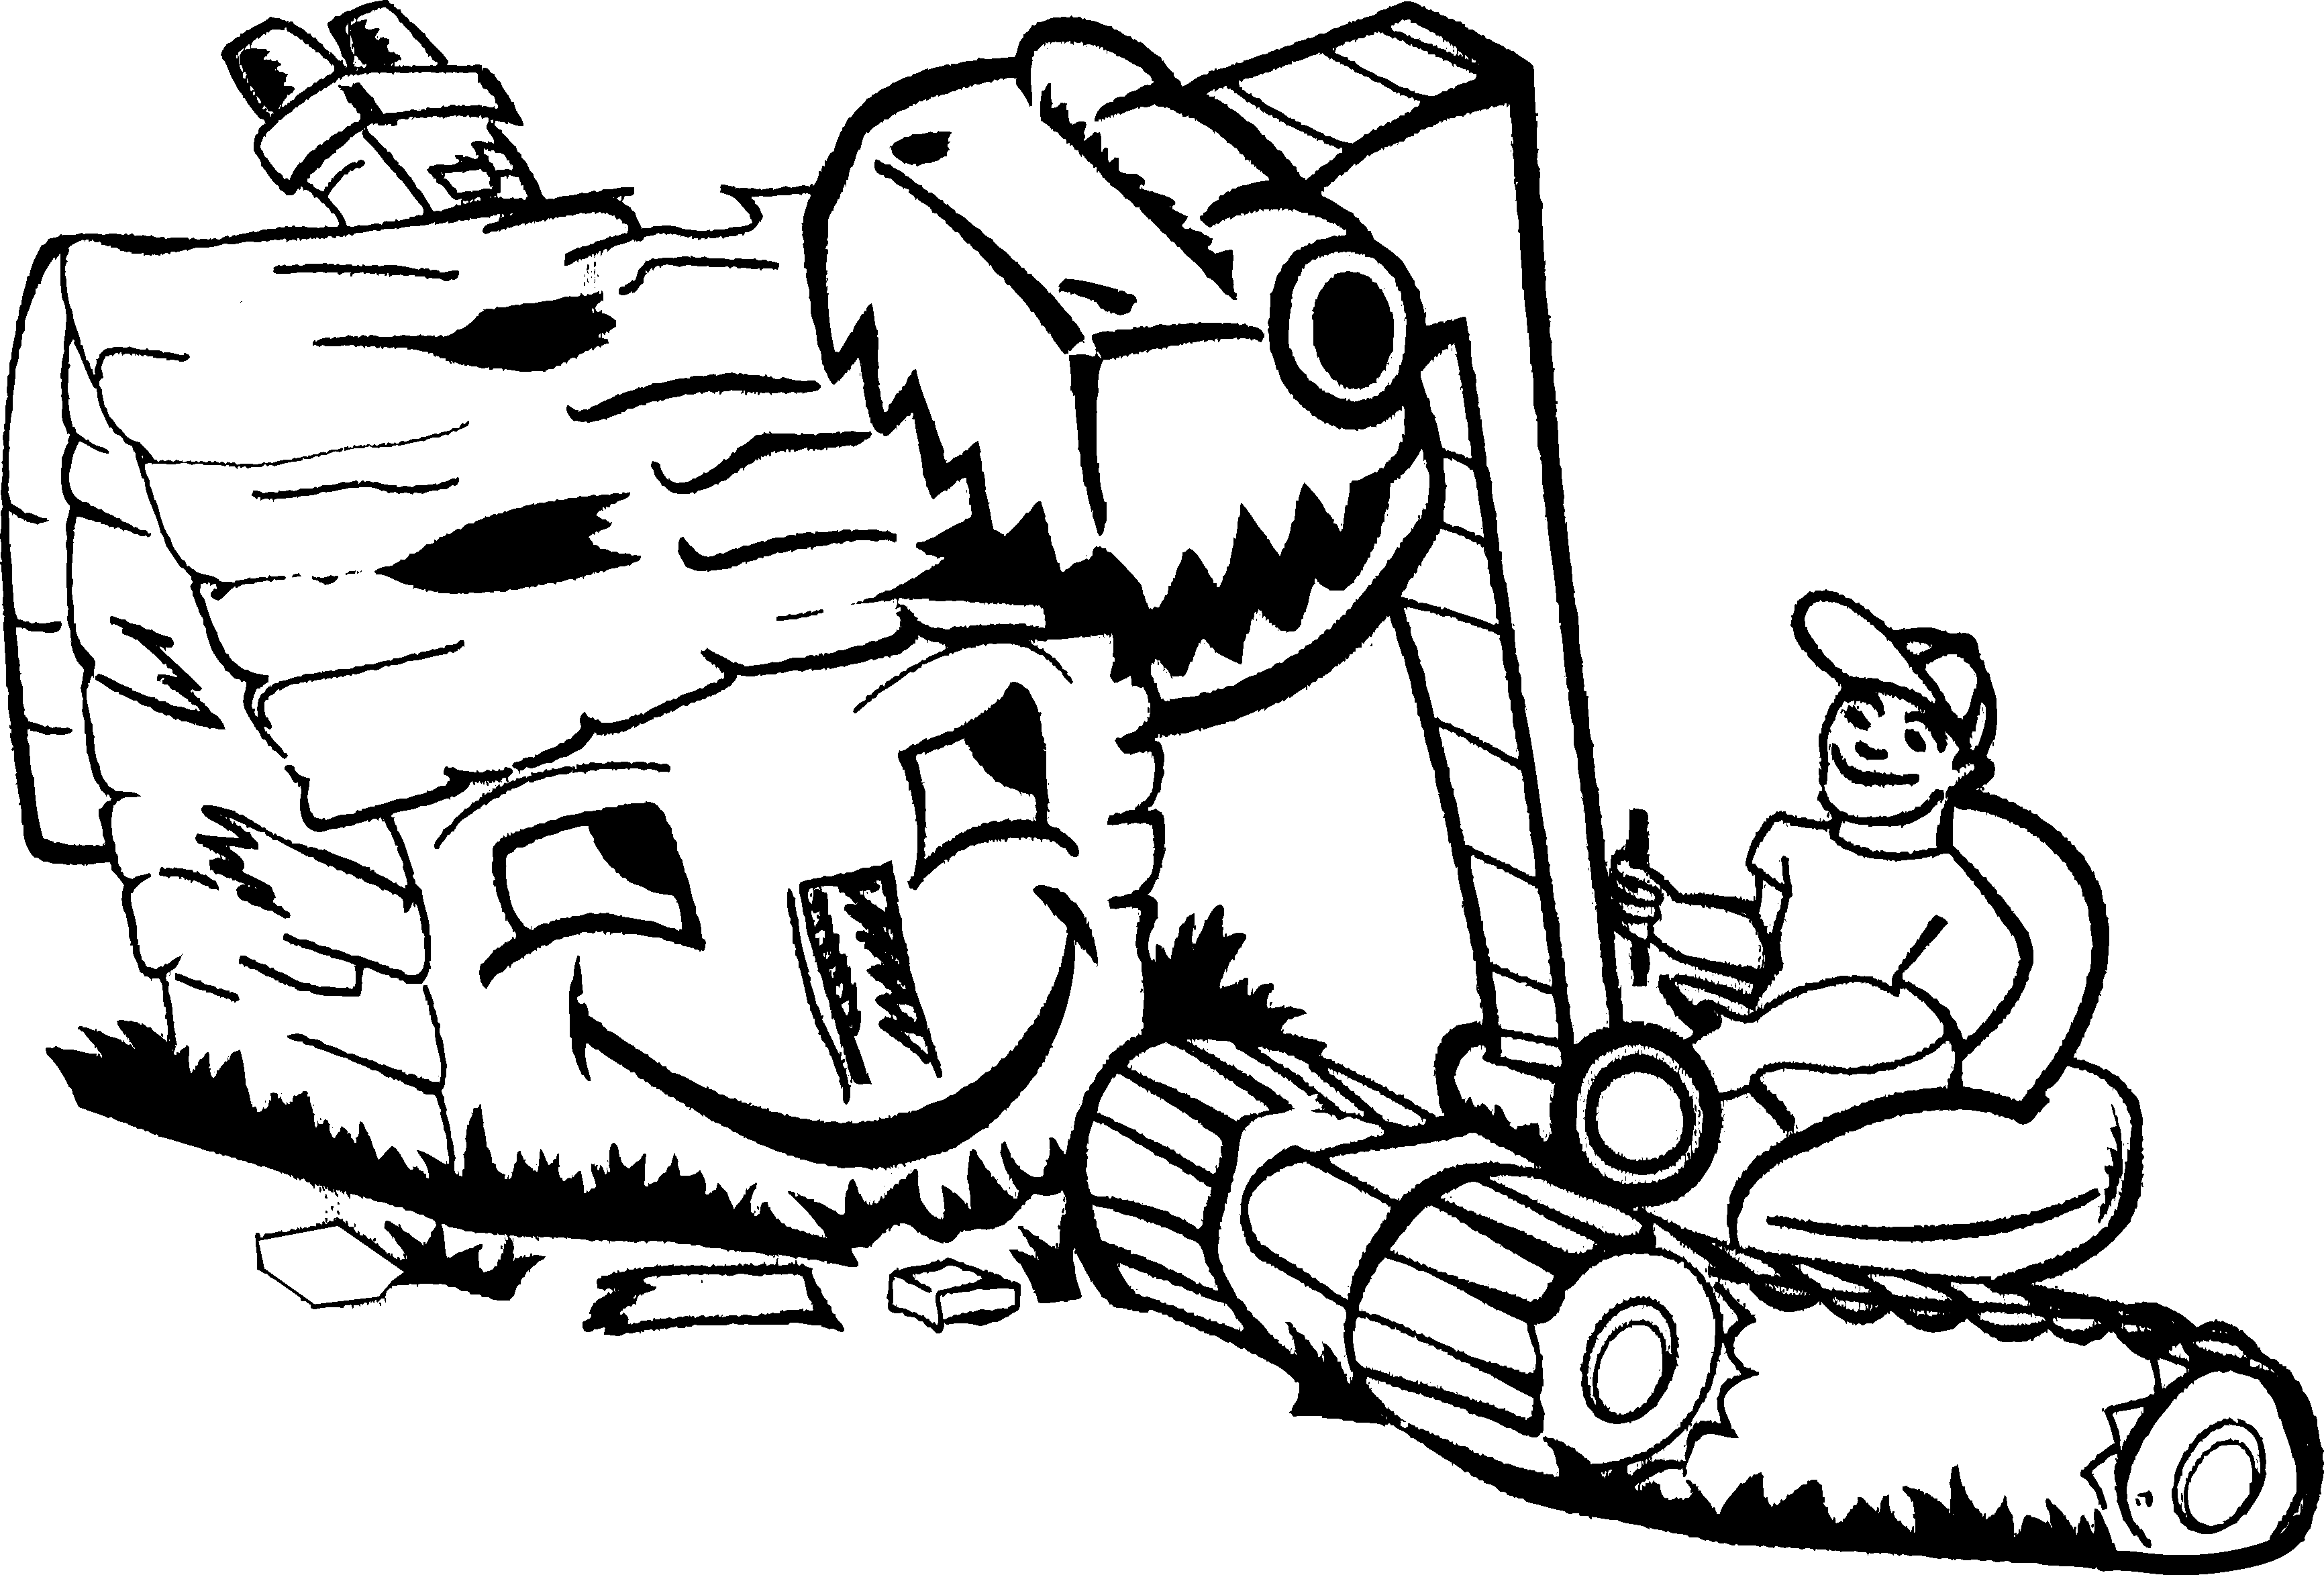 pt adelaide salvage logo